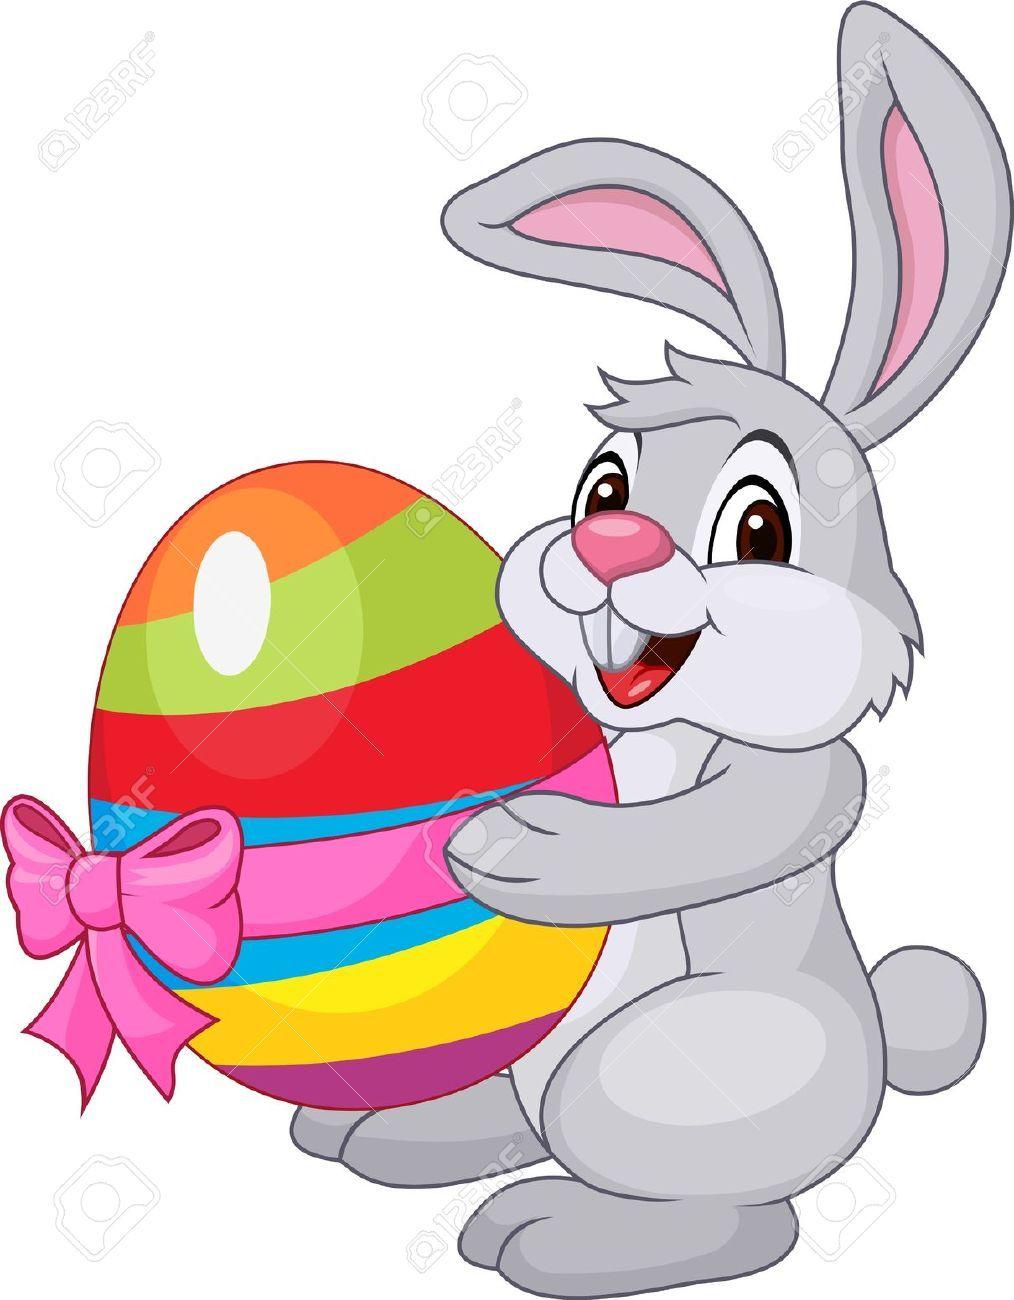 1014x1300 Surprise Easter Bunny Cartoons Rabbit Cartoon Clip Art Cute Png